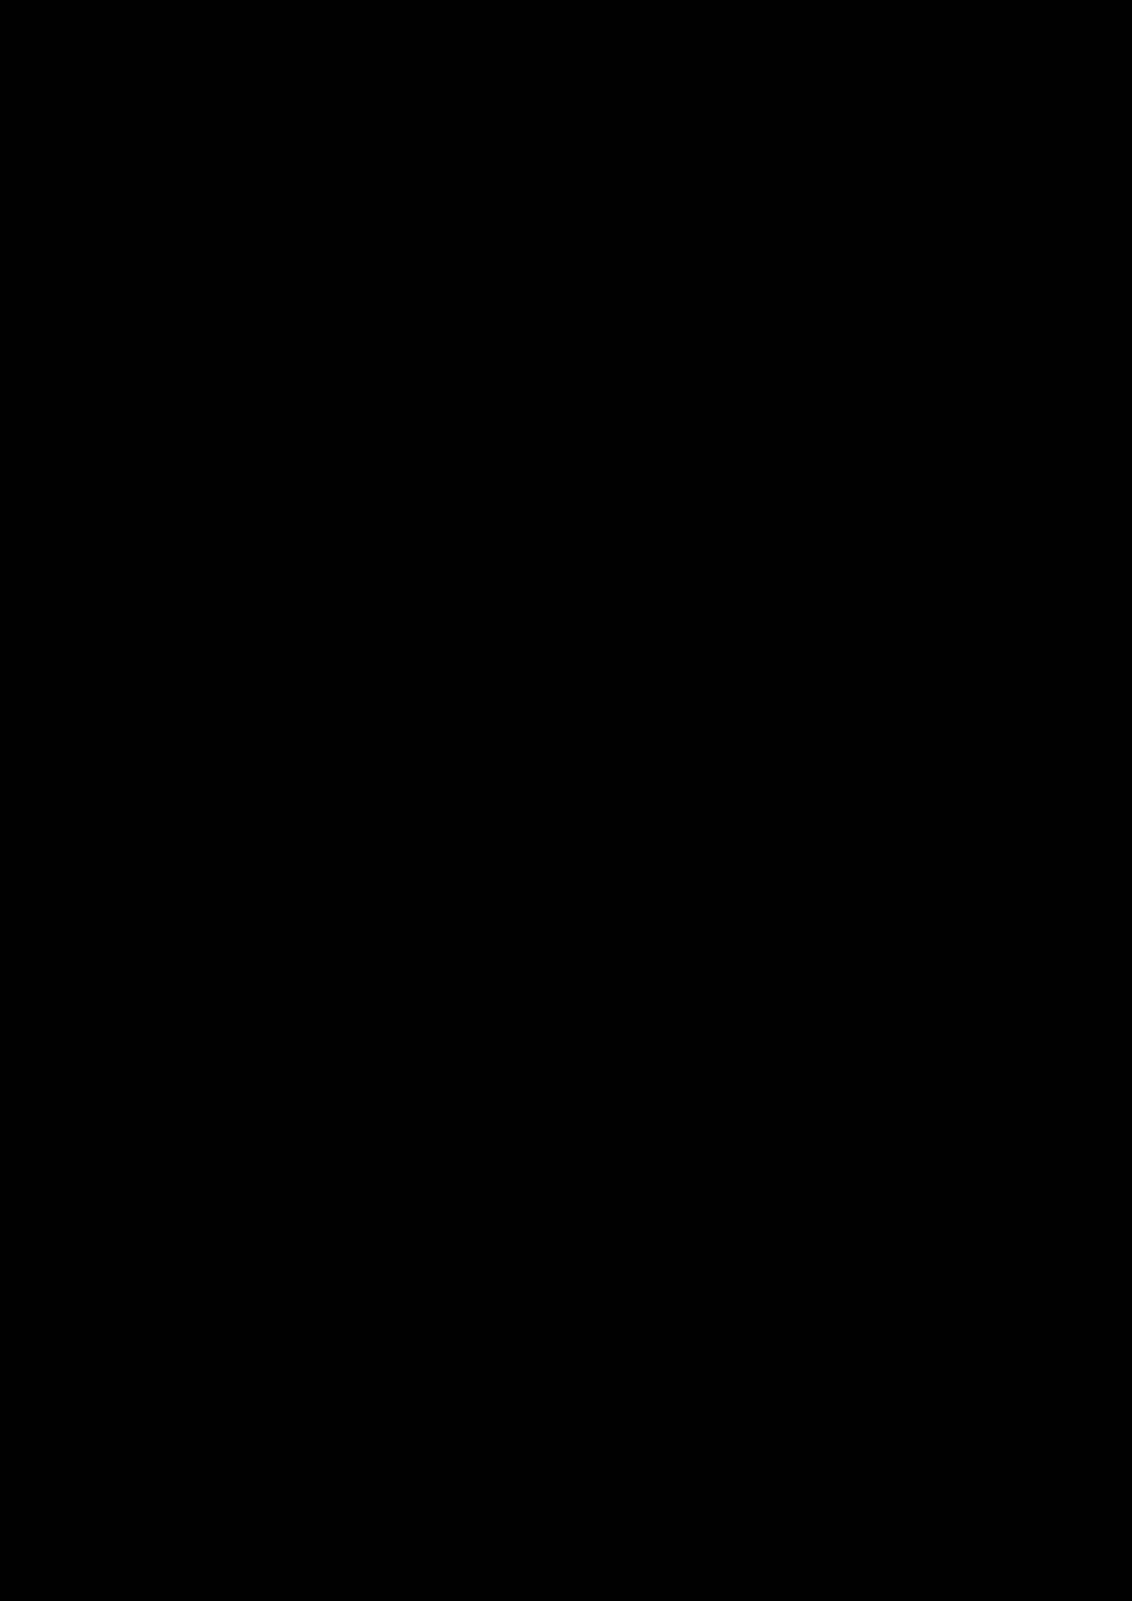 Belyiy sokol slide, Image 169